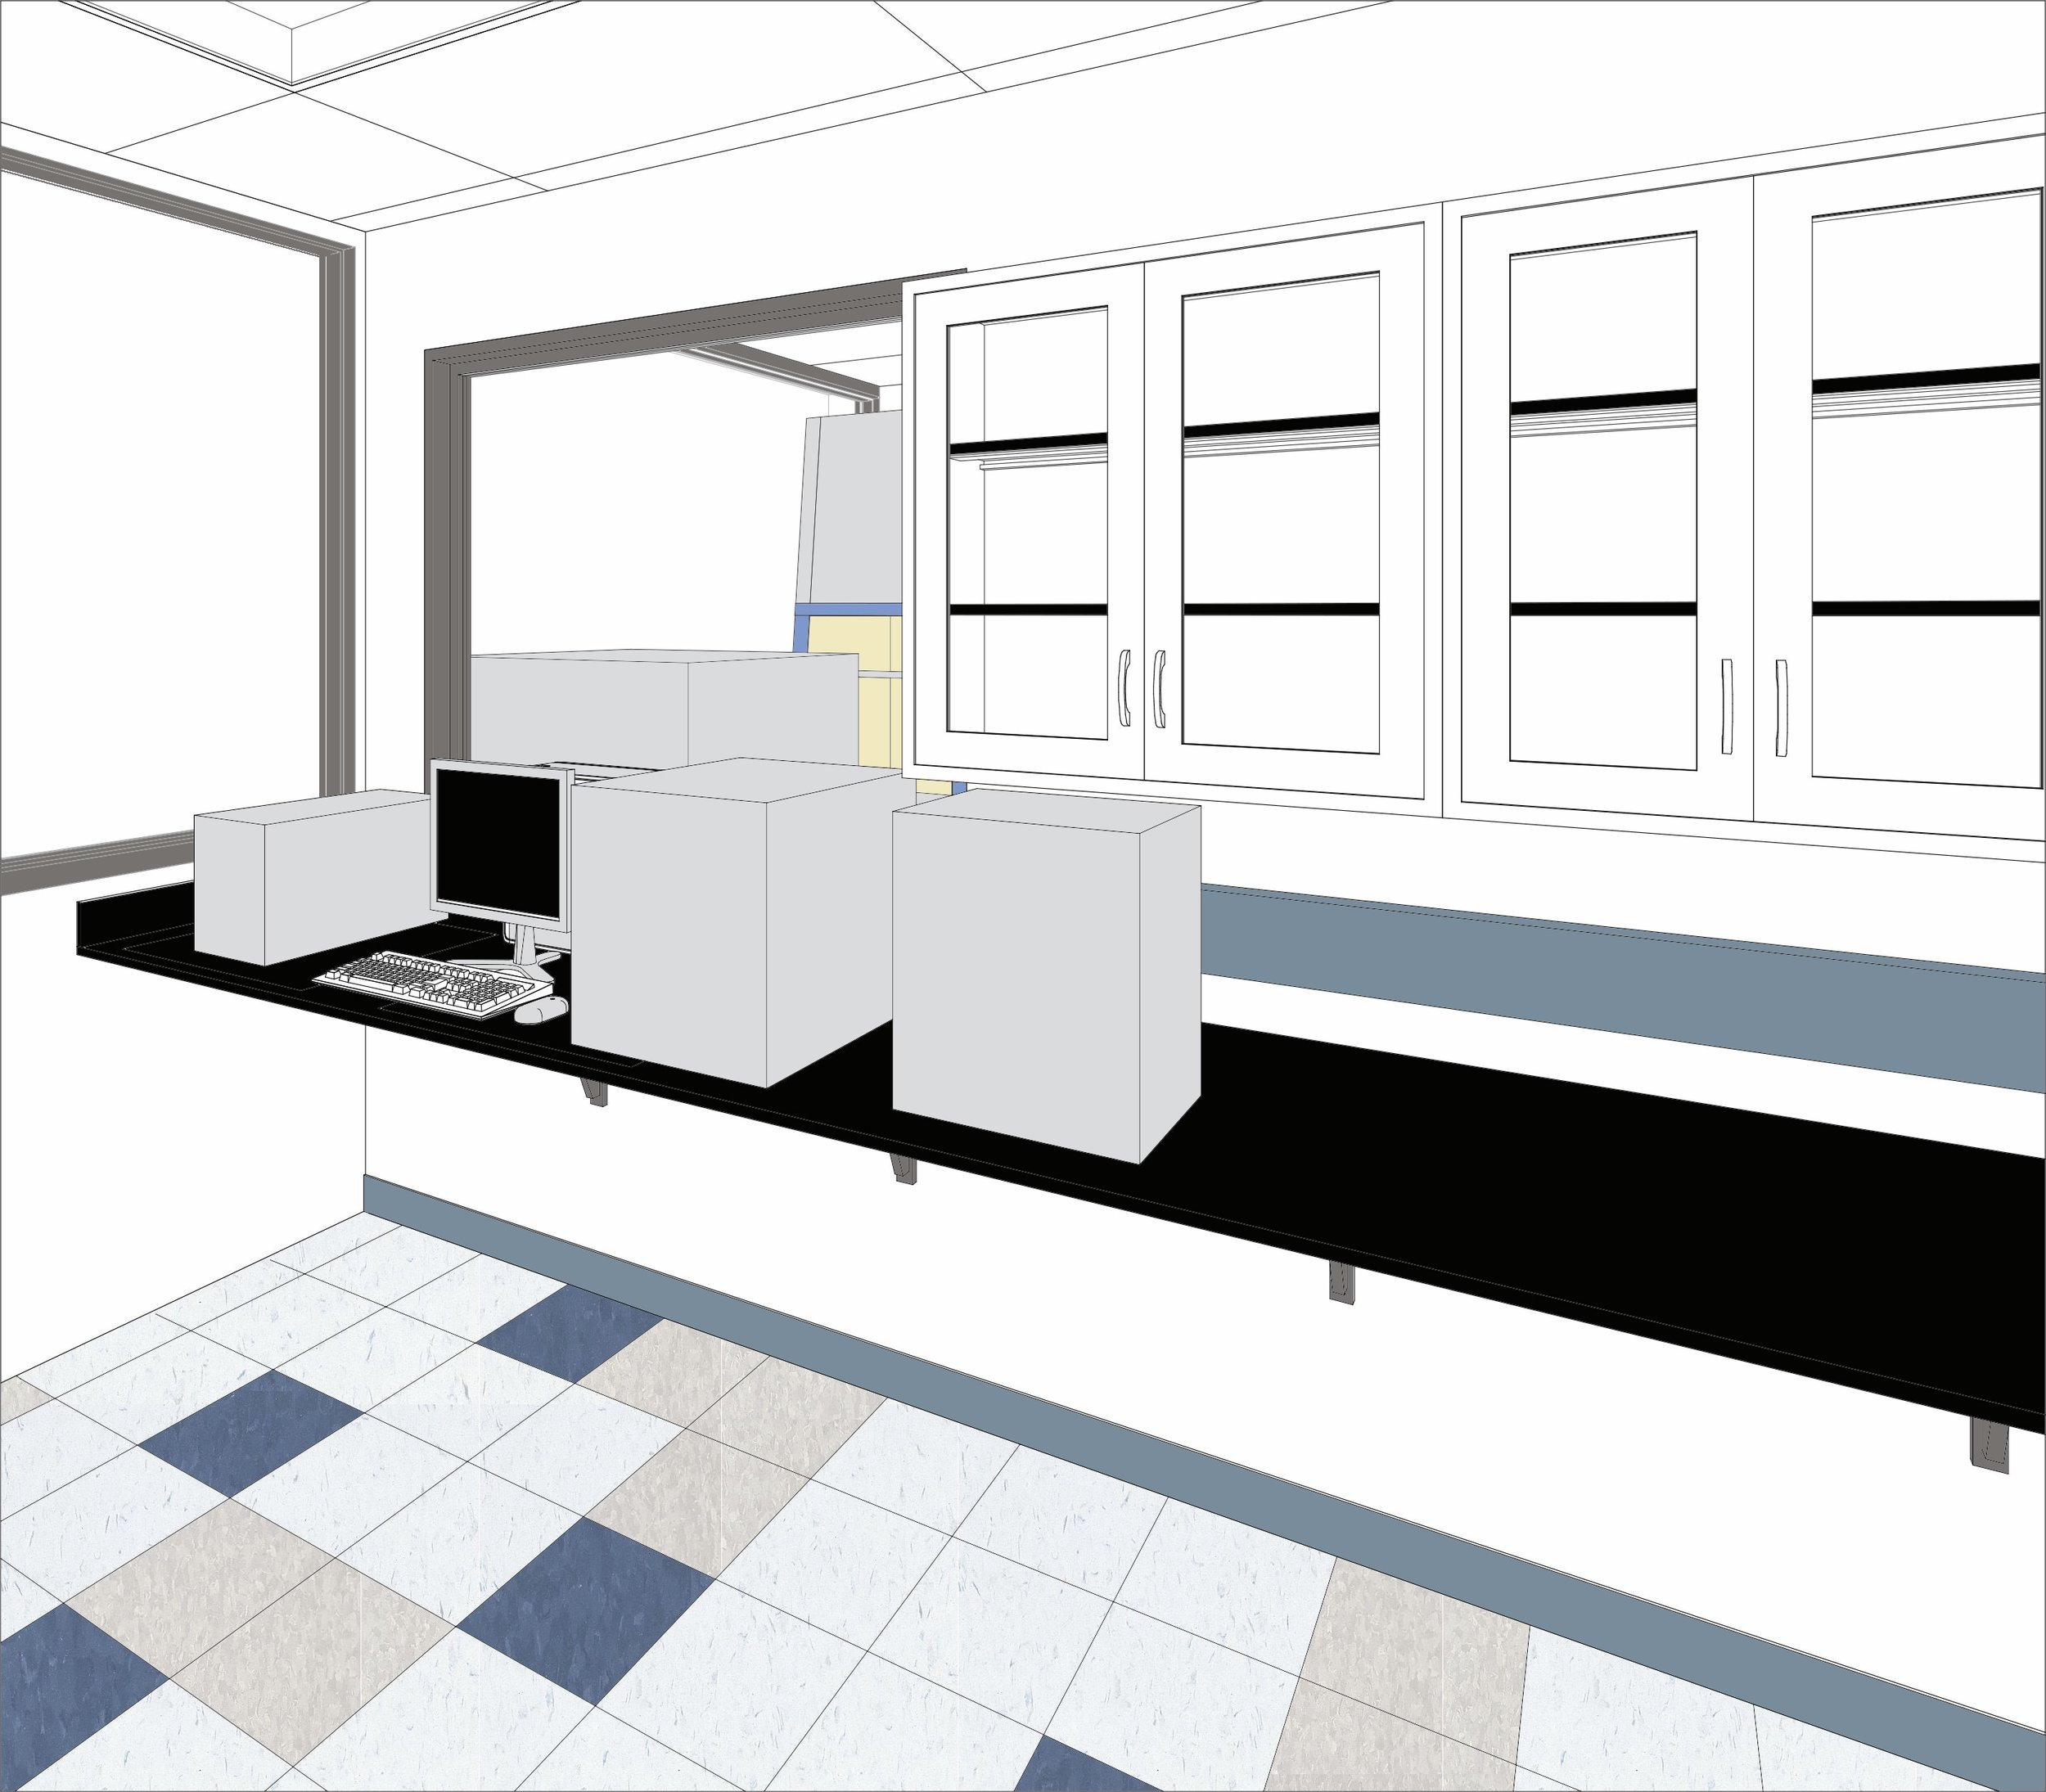 Laboratory 3310 3_BW.jpg